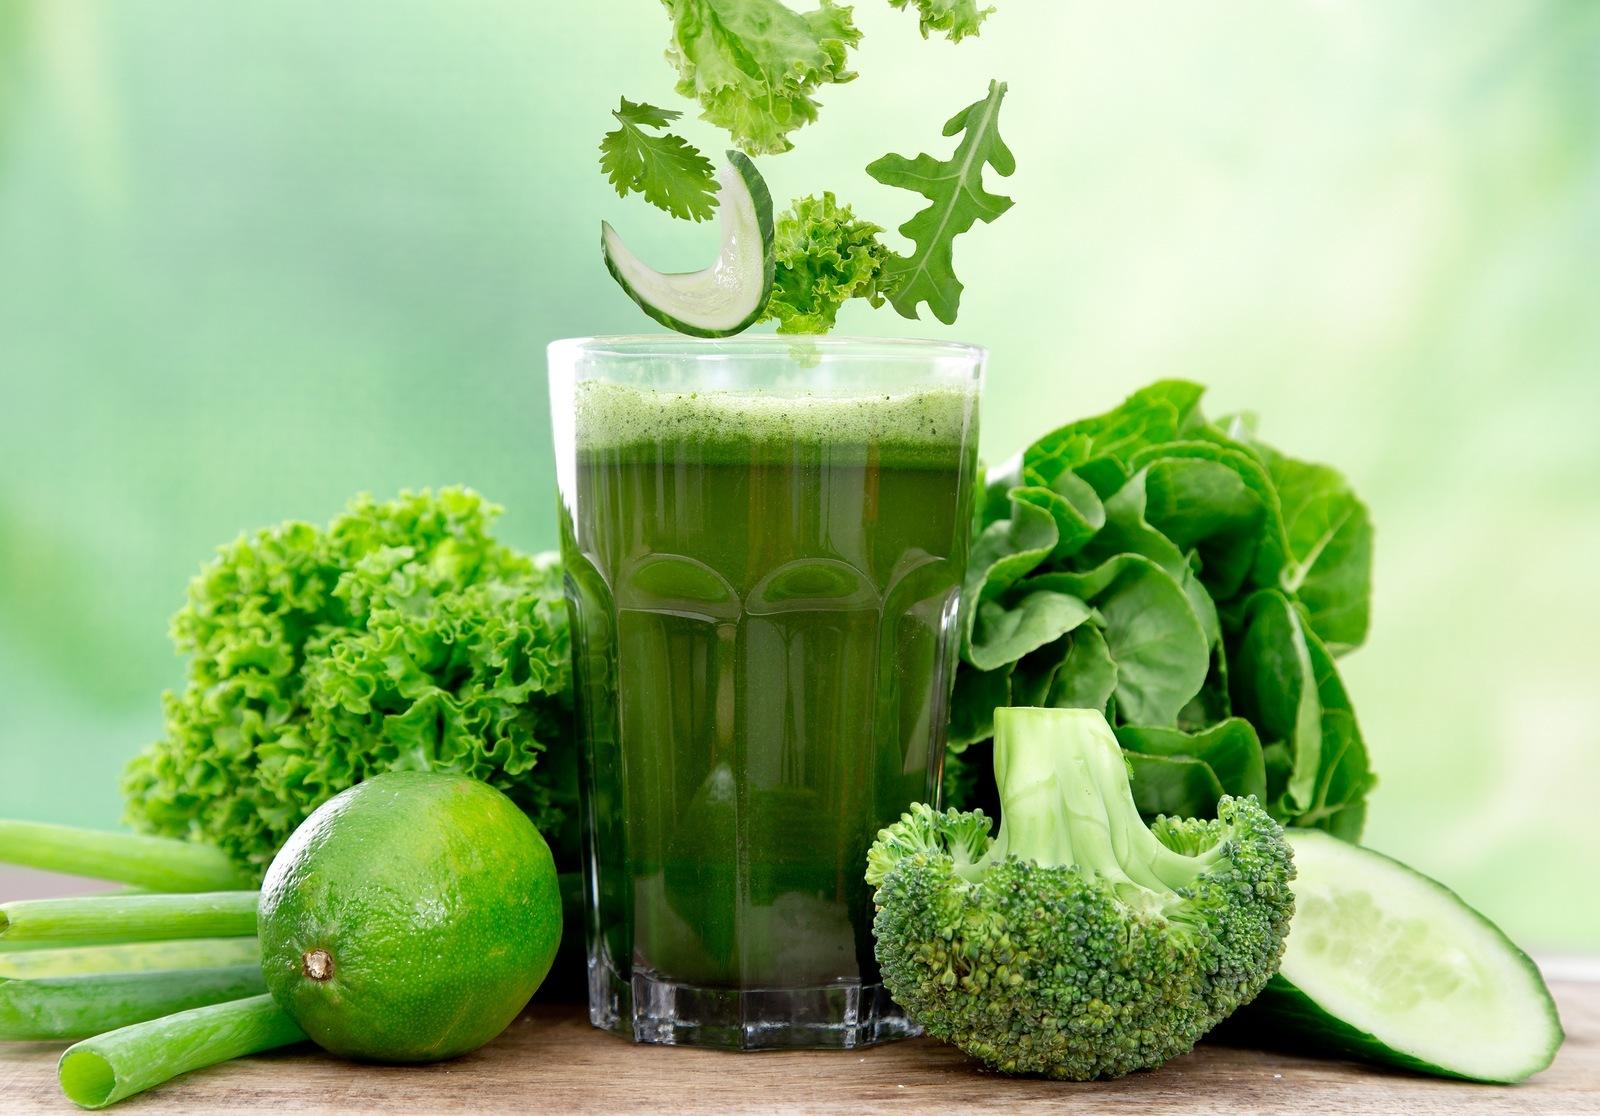 Suc de legume verzi, Foto: healthambition.com